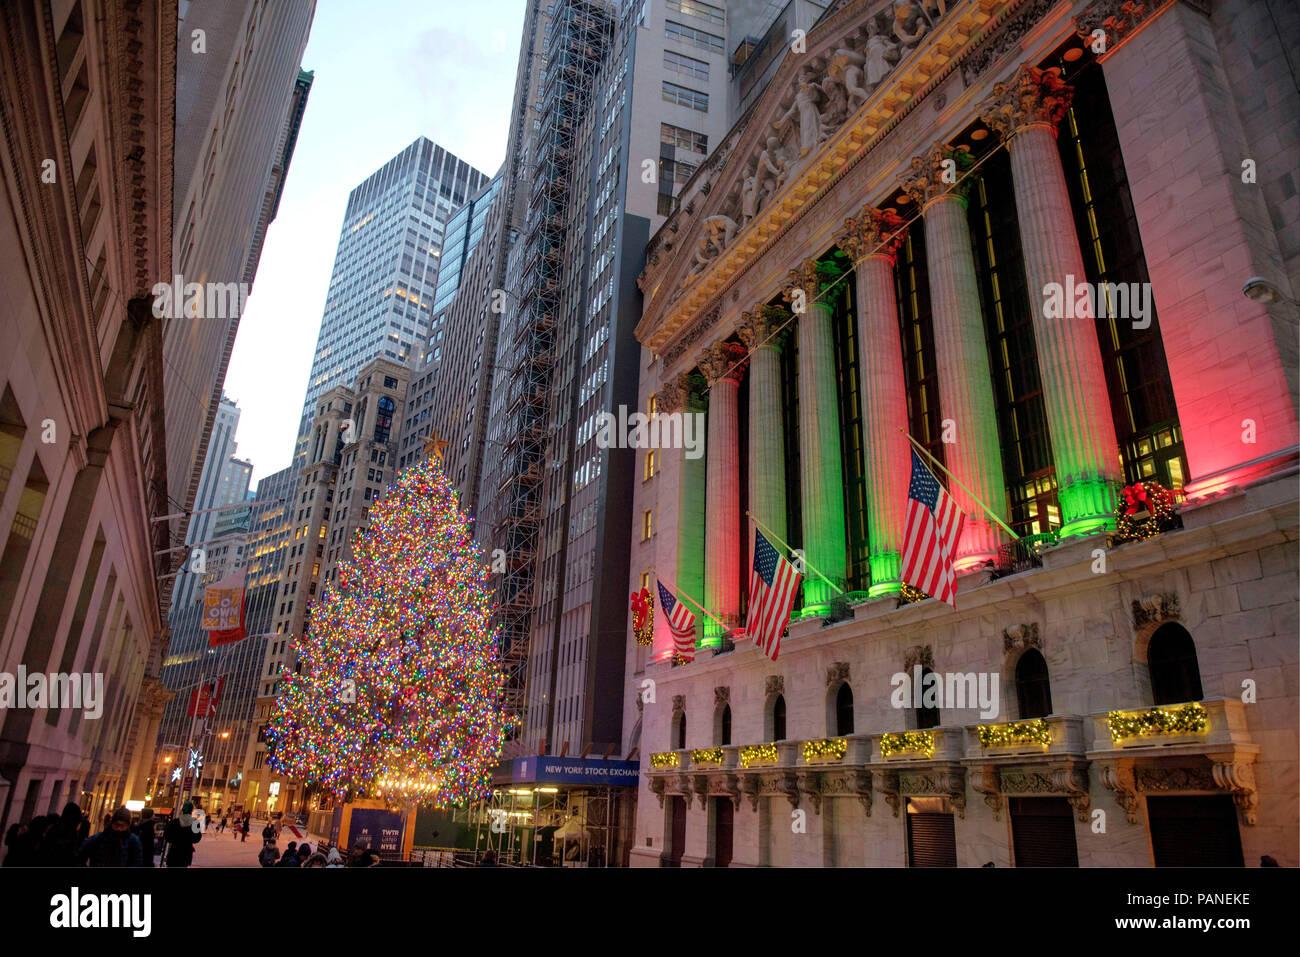 The Stock Exchange Building in Wall Street at Christmas time, Manhattan, New York City, USA, December 30, 2017    Photo © Fabio Mazzarella/Sintesi/Ala Stock Photo